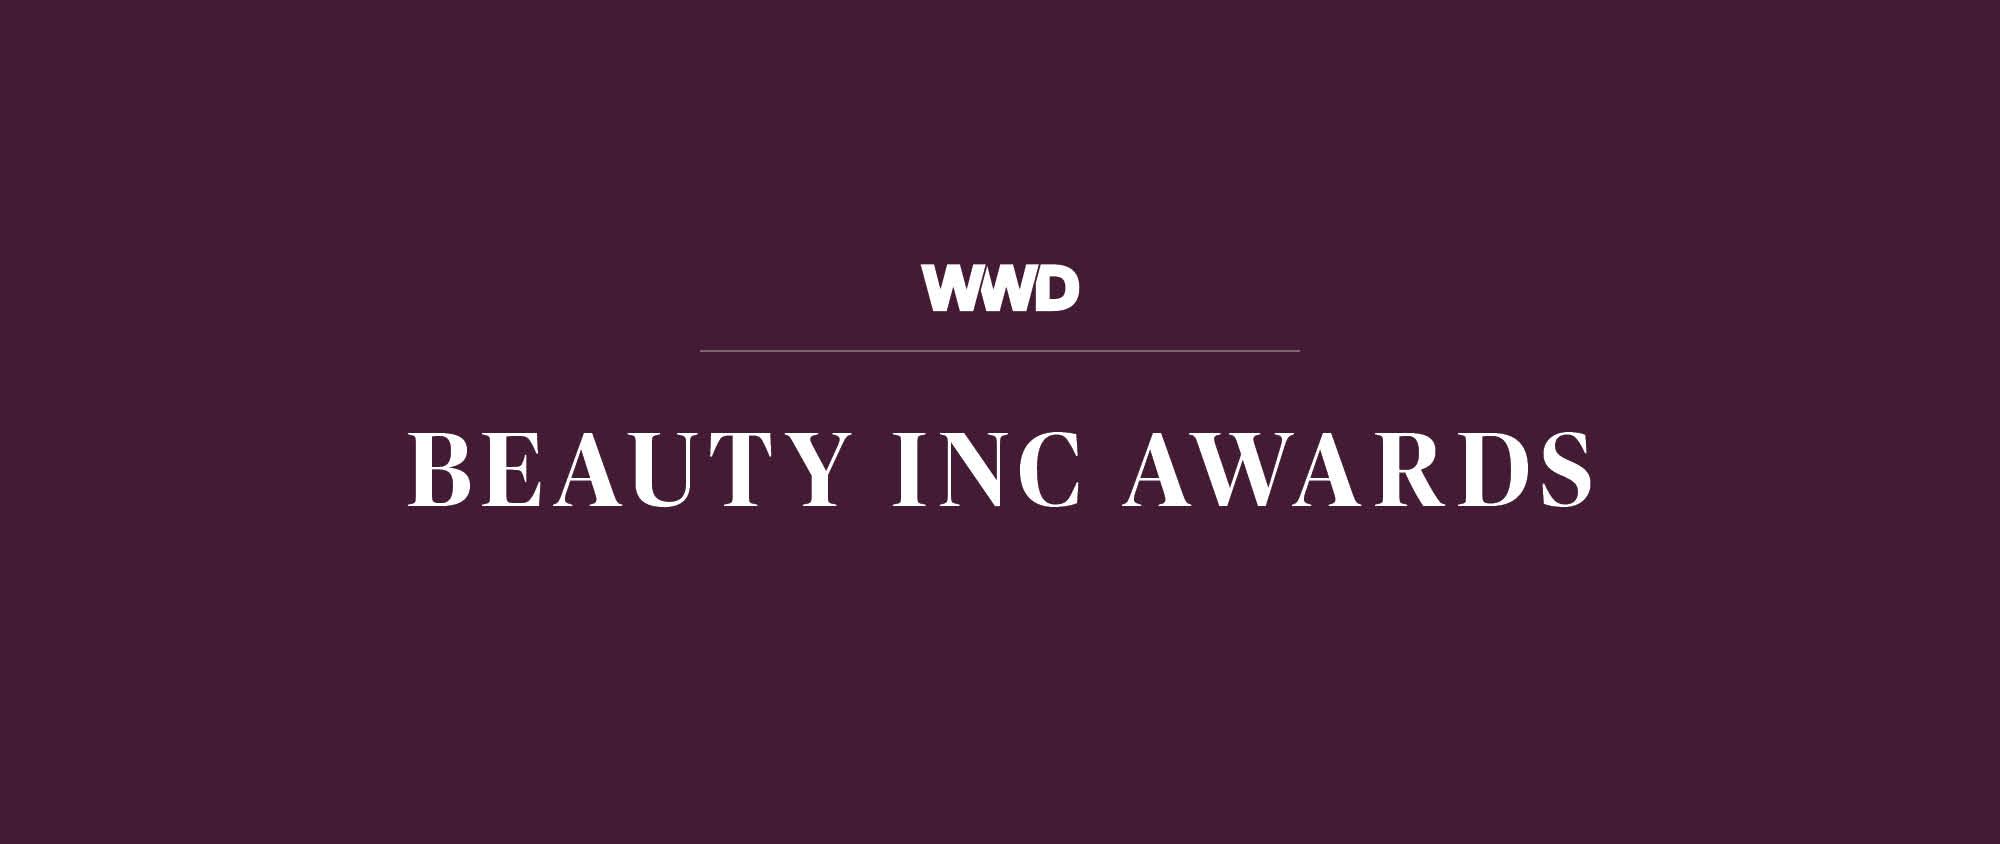 WWD_BEAUTY-INC-AWARDS